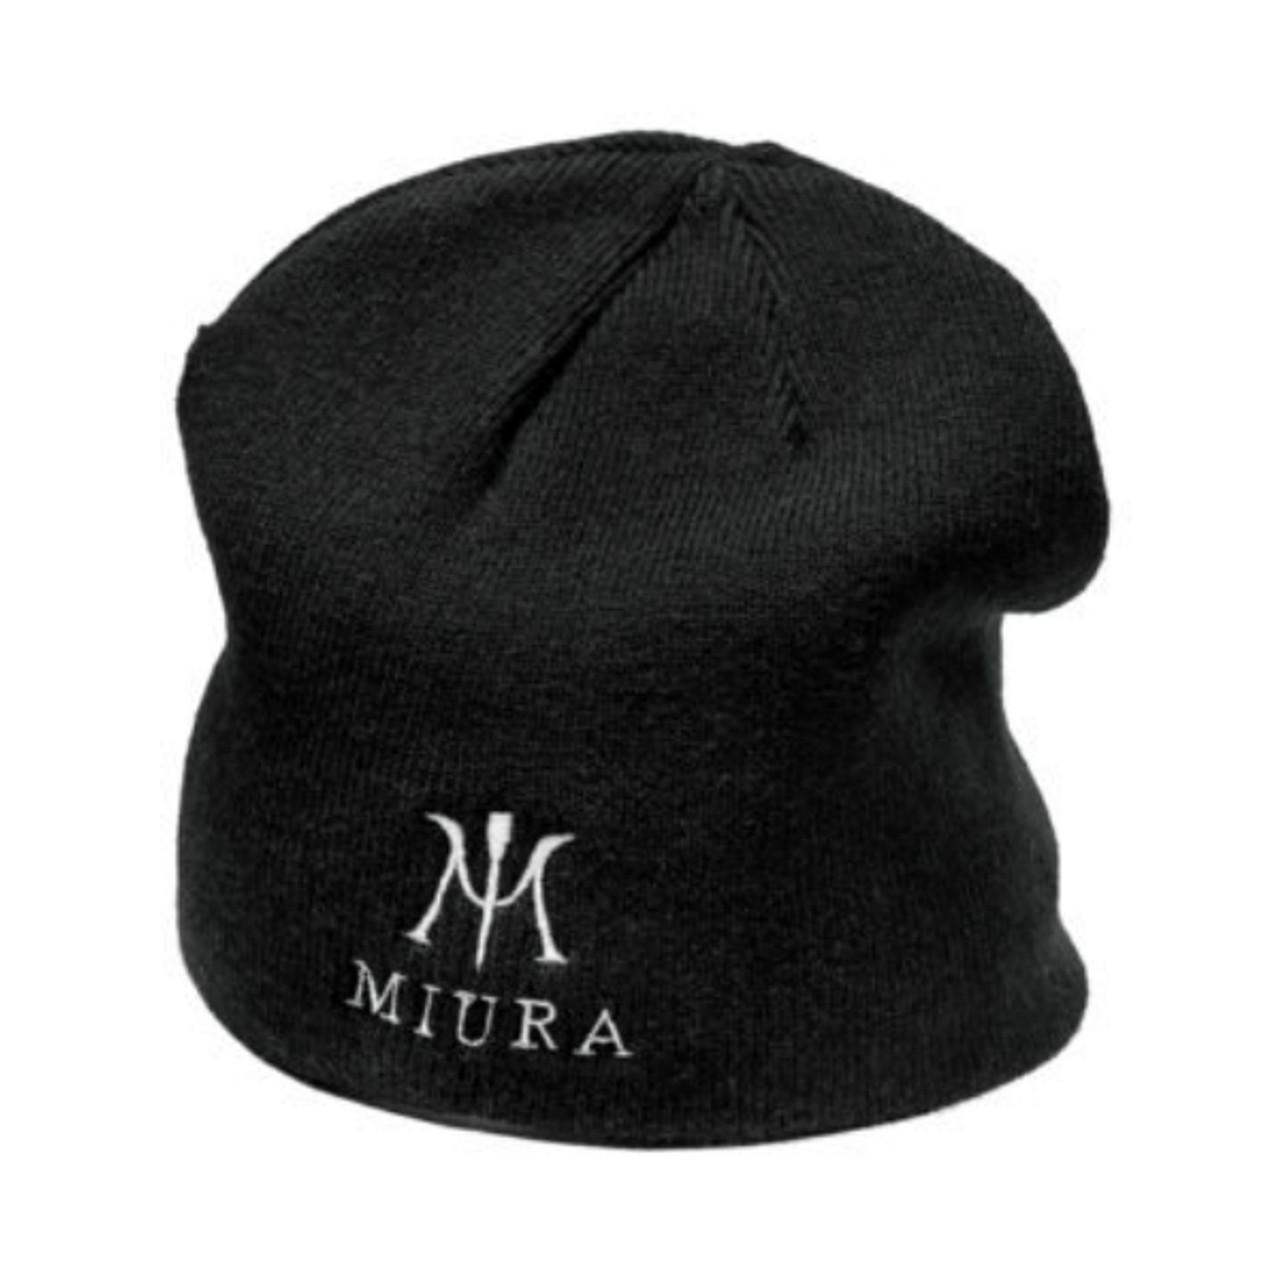 Miura Knit Beanie Hats - Golf Beanies - Tour Shop Fresno 2cf2285f364